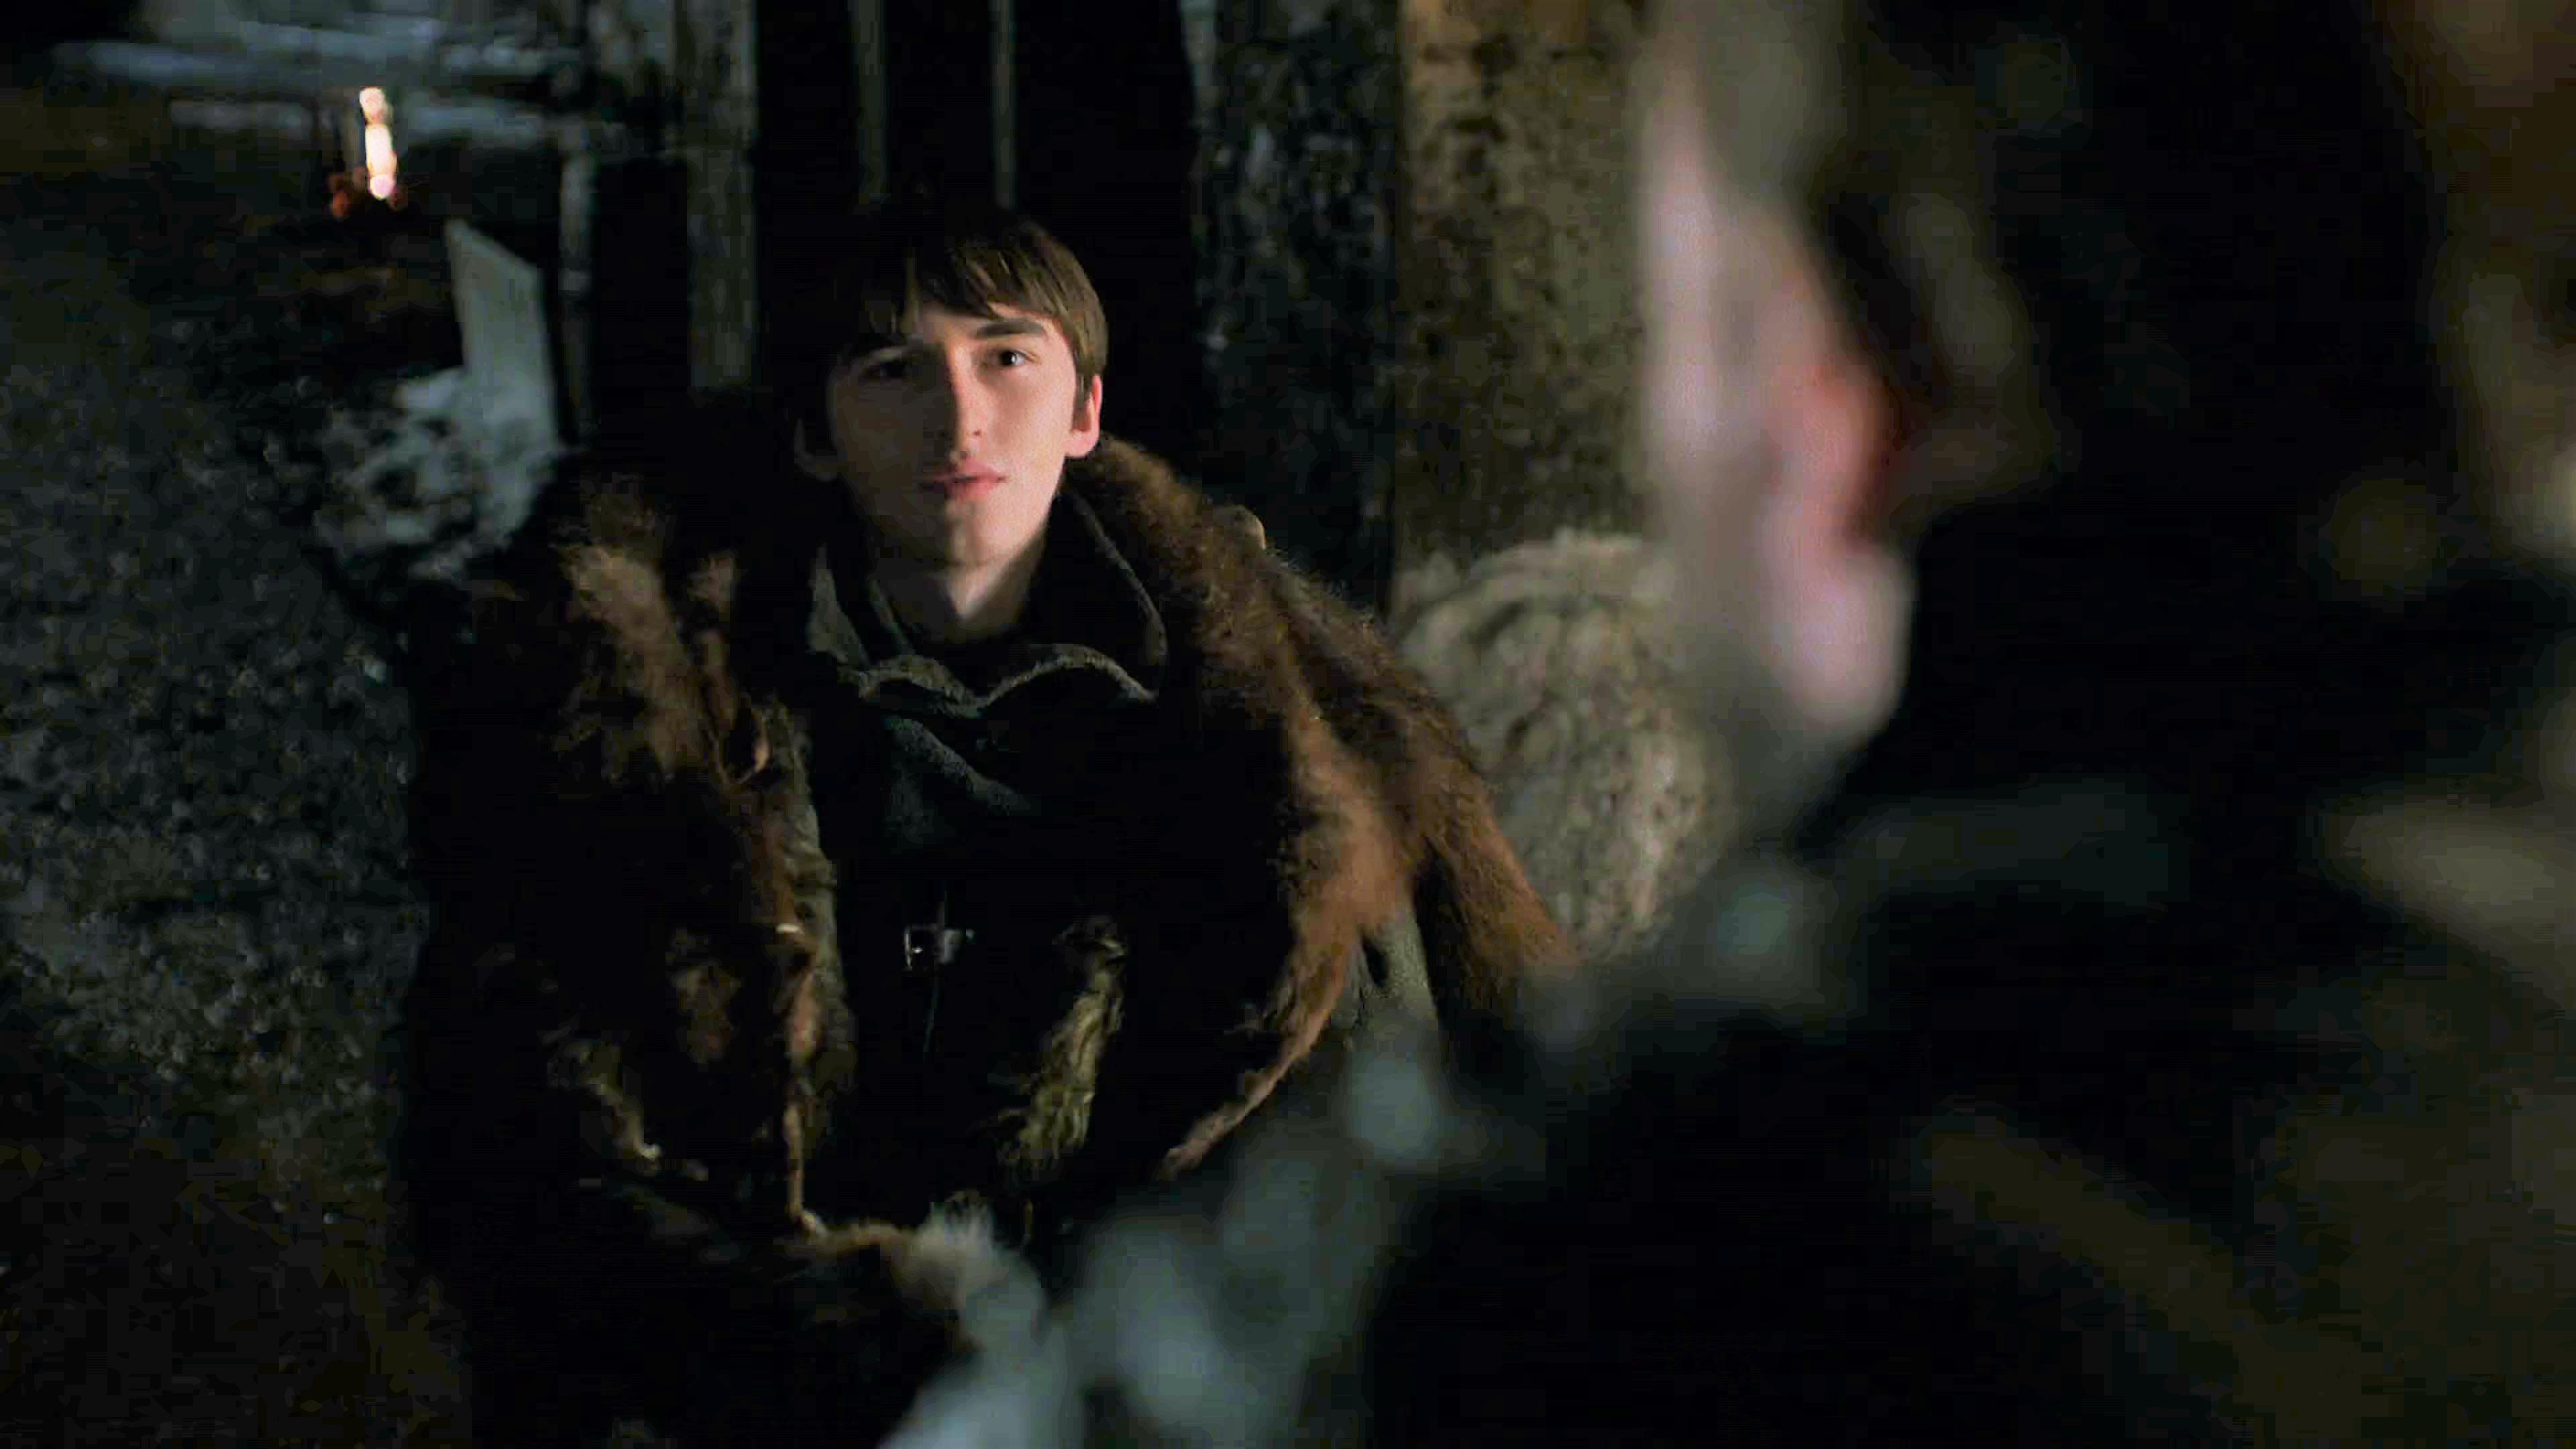 9. Season 8 Trailer Bran Sam Winterfell